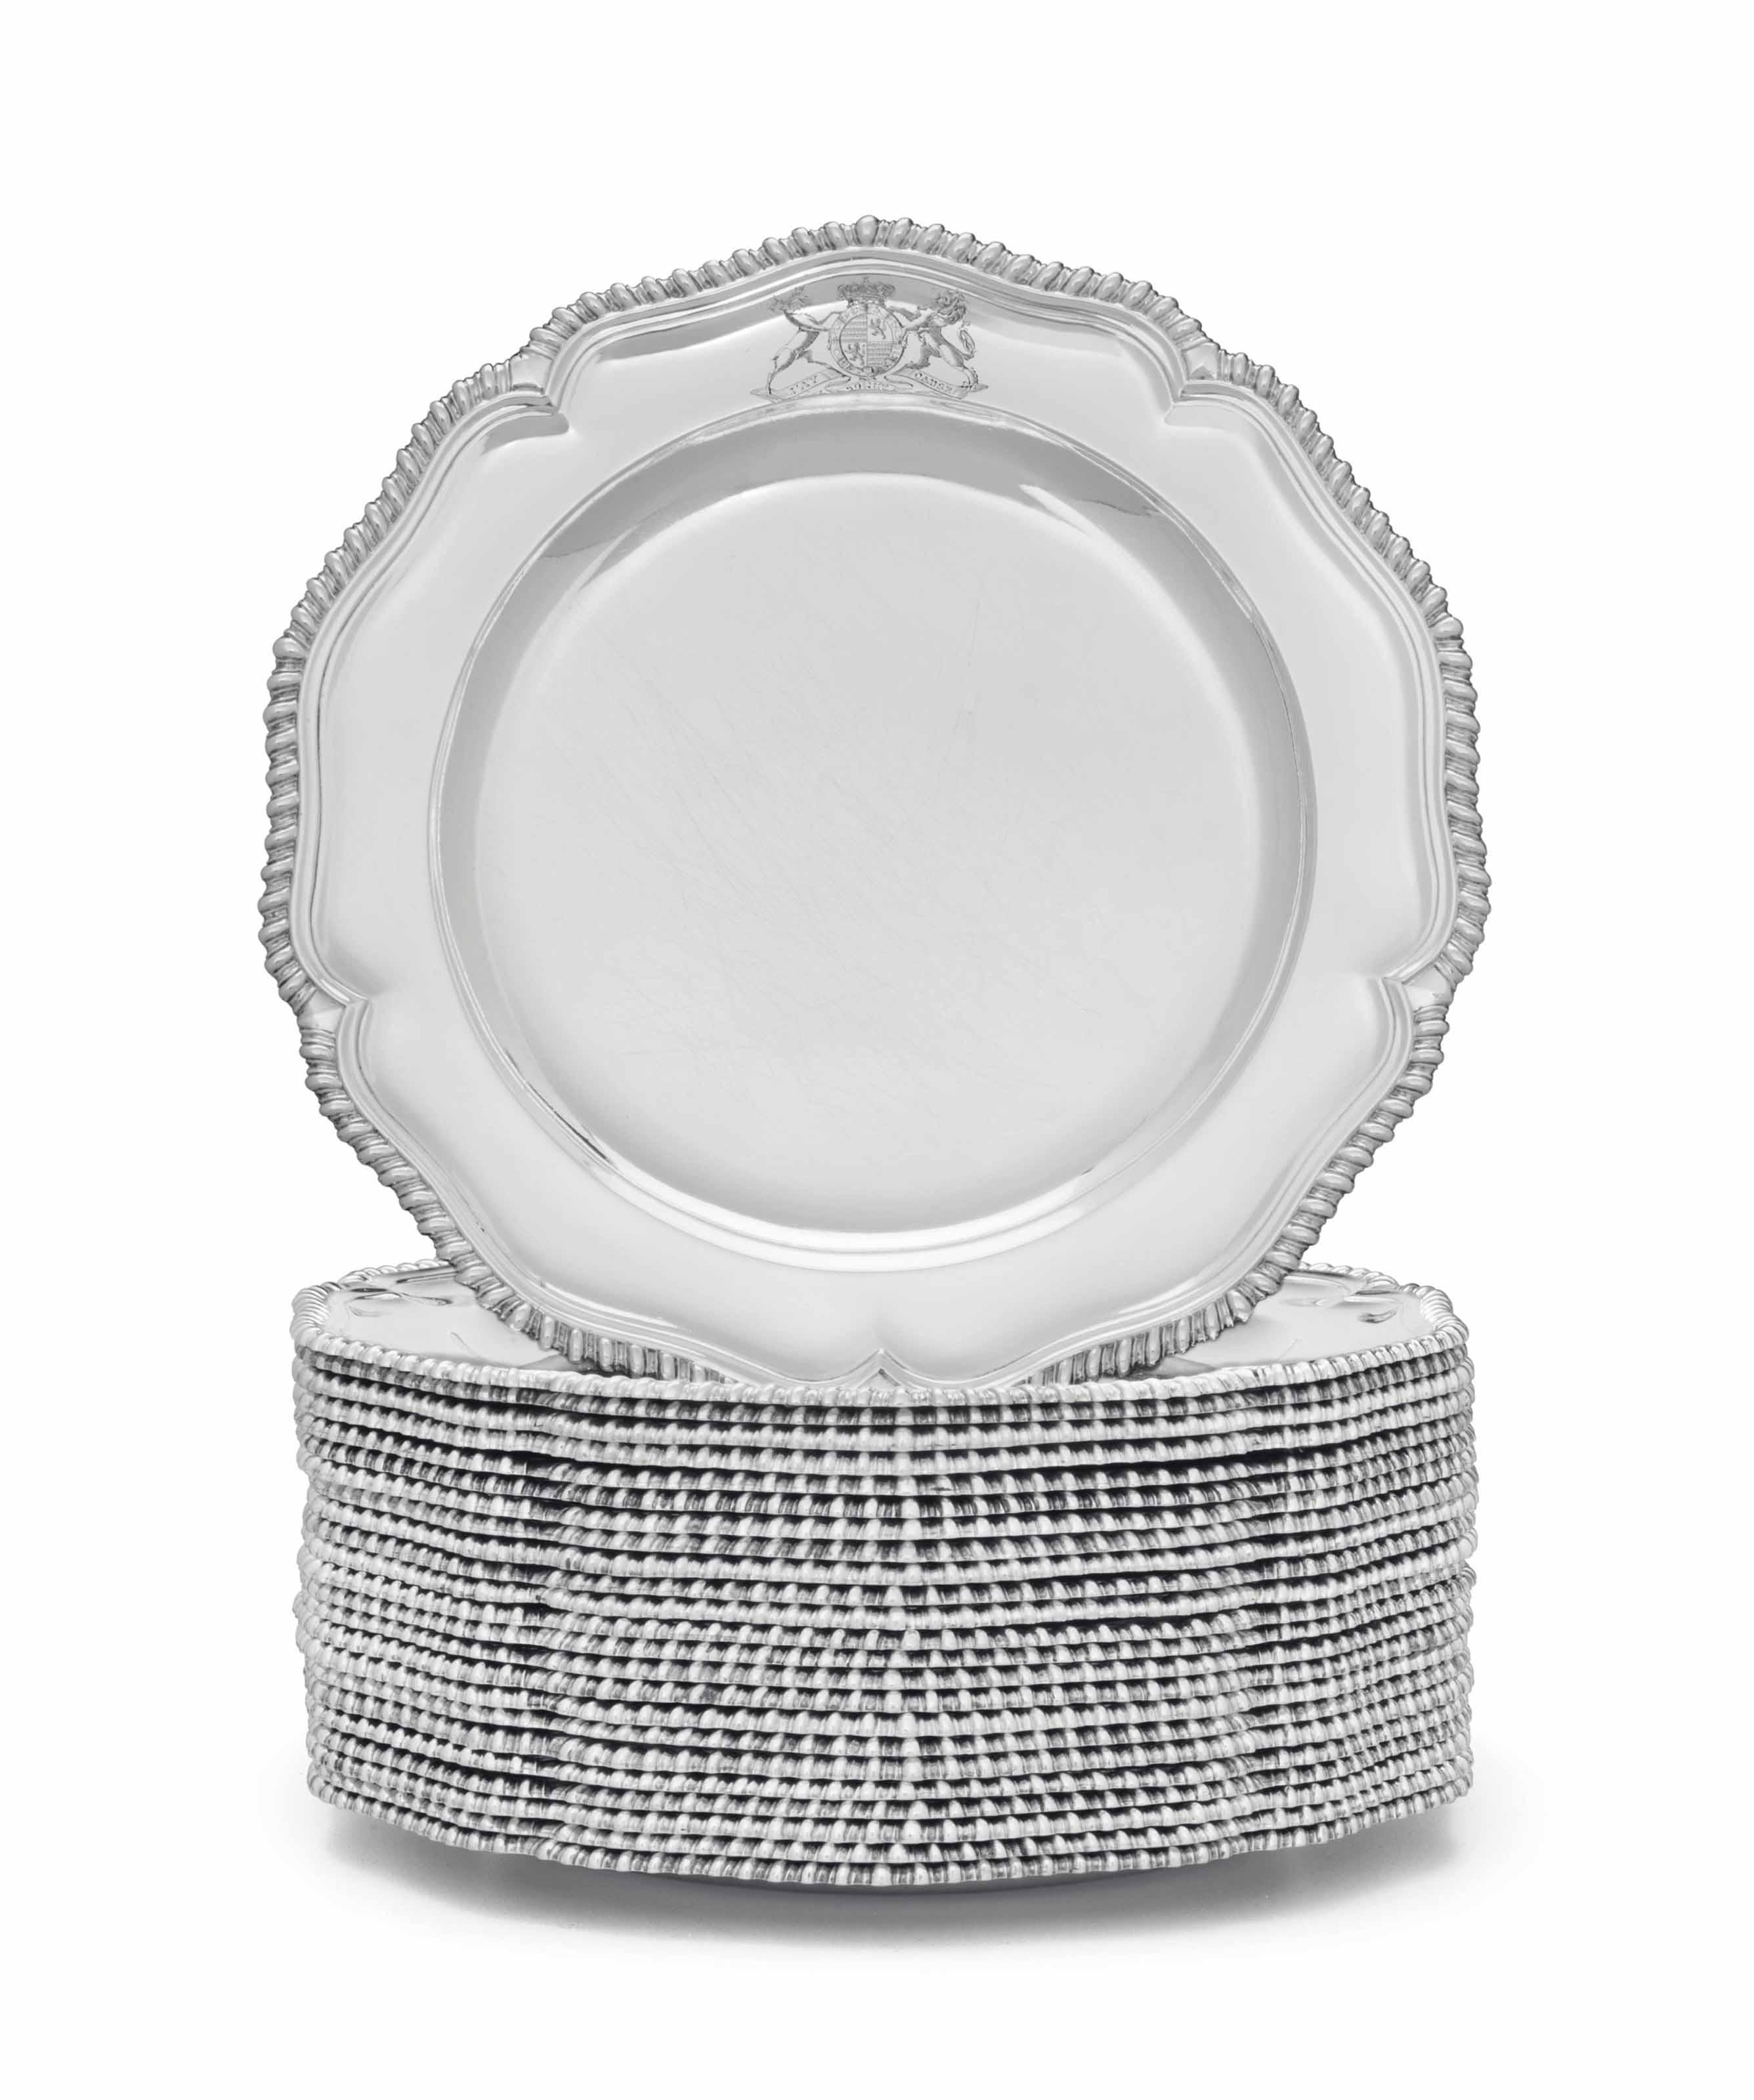 A SET OF TWENTY-FOUR GEORGE III SILVER DINNER PLATES